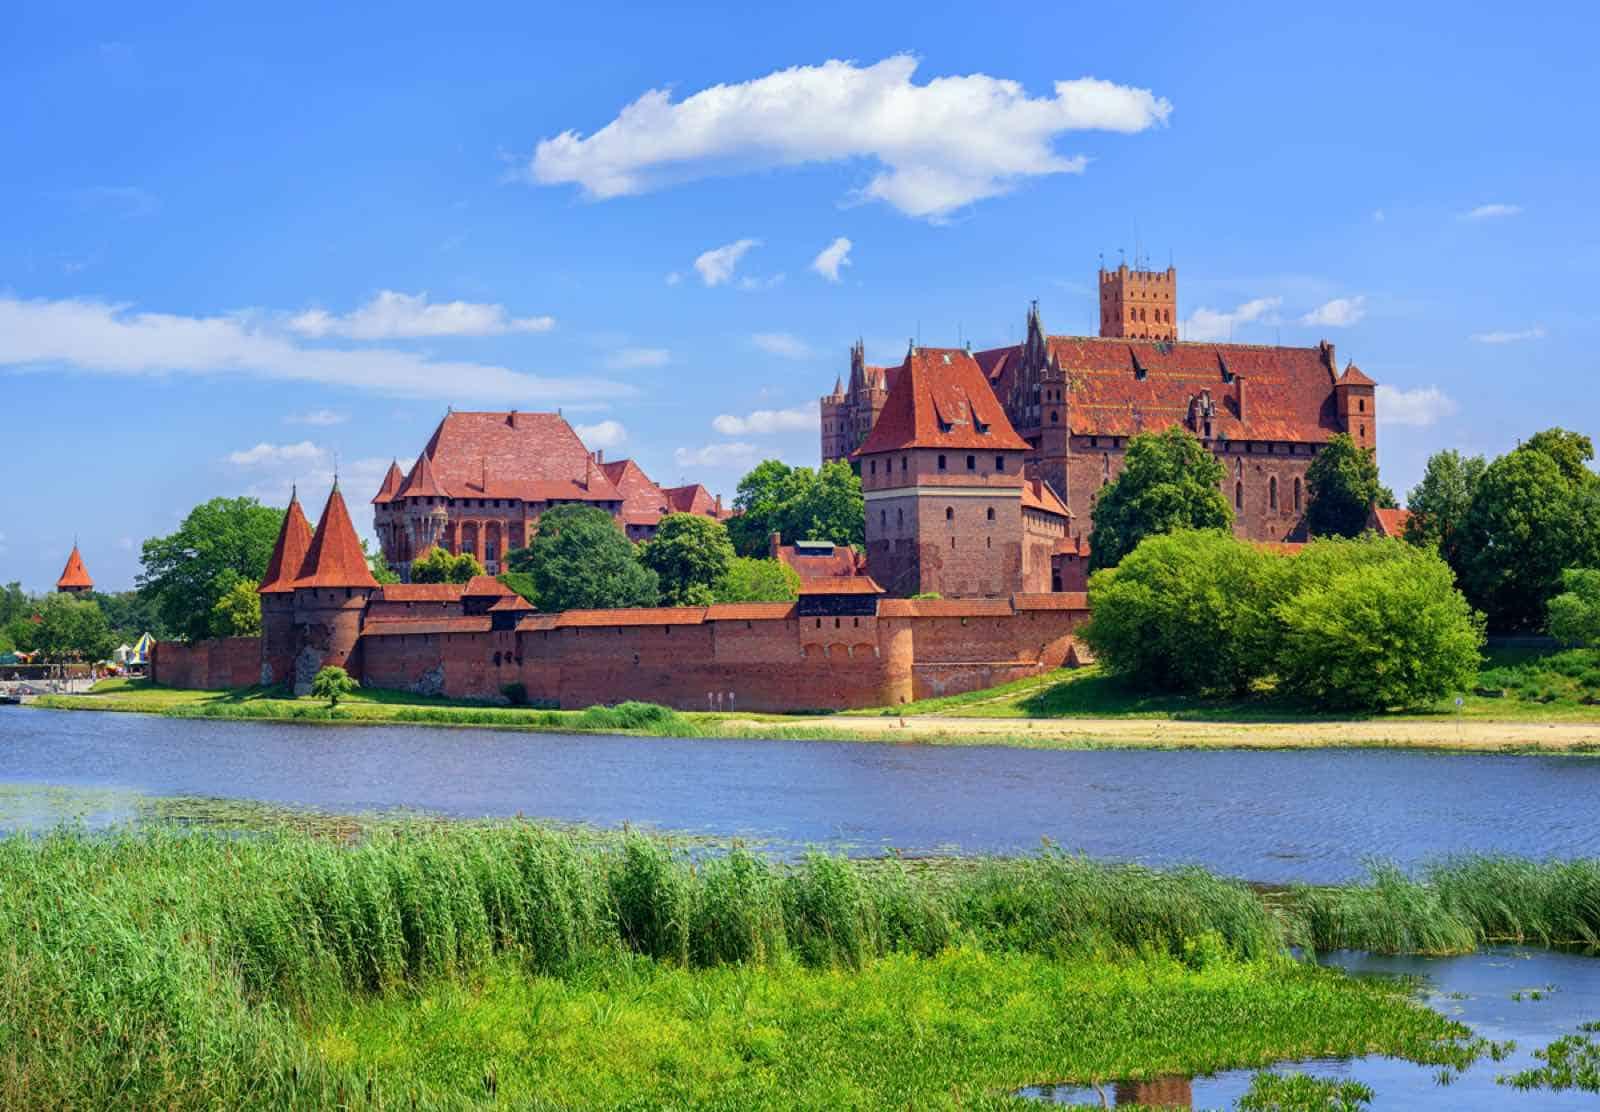 Malbork korsridderborg i Polen